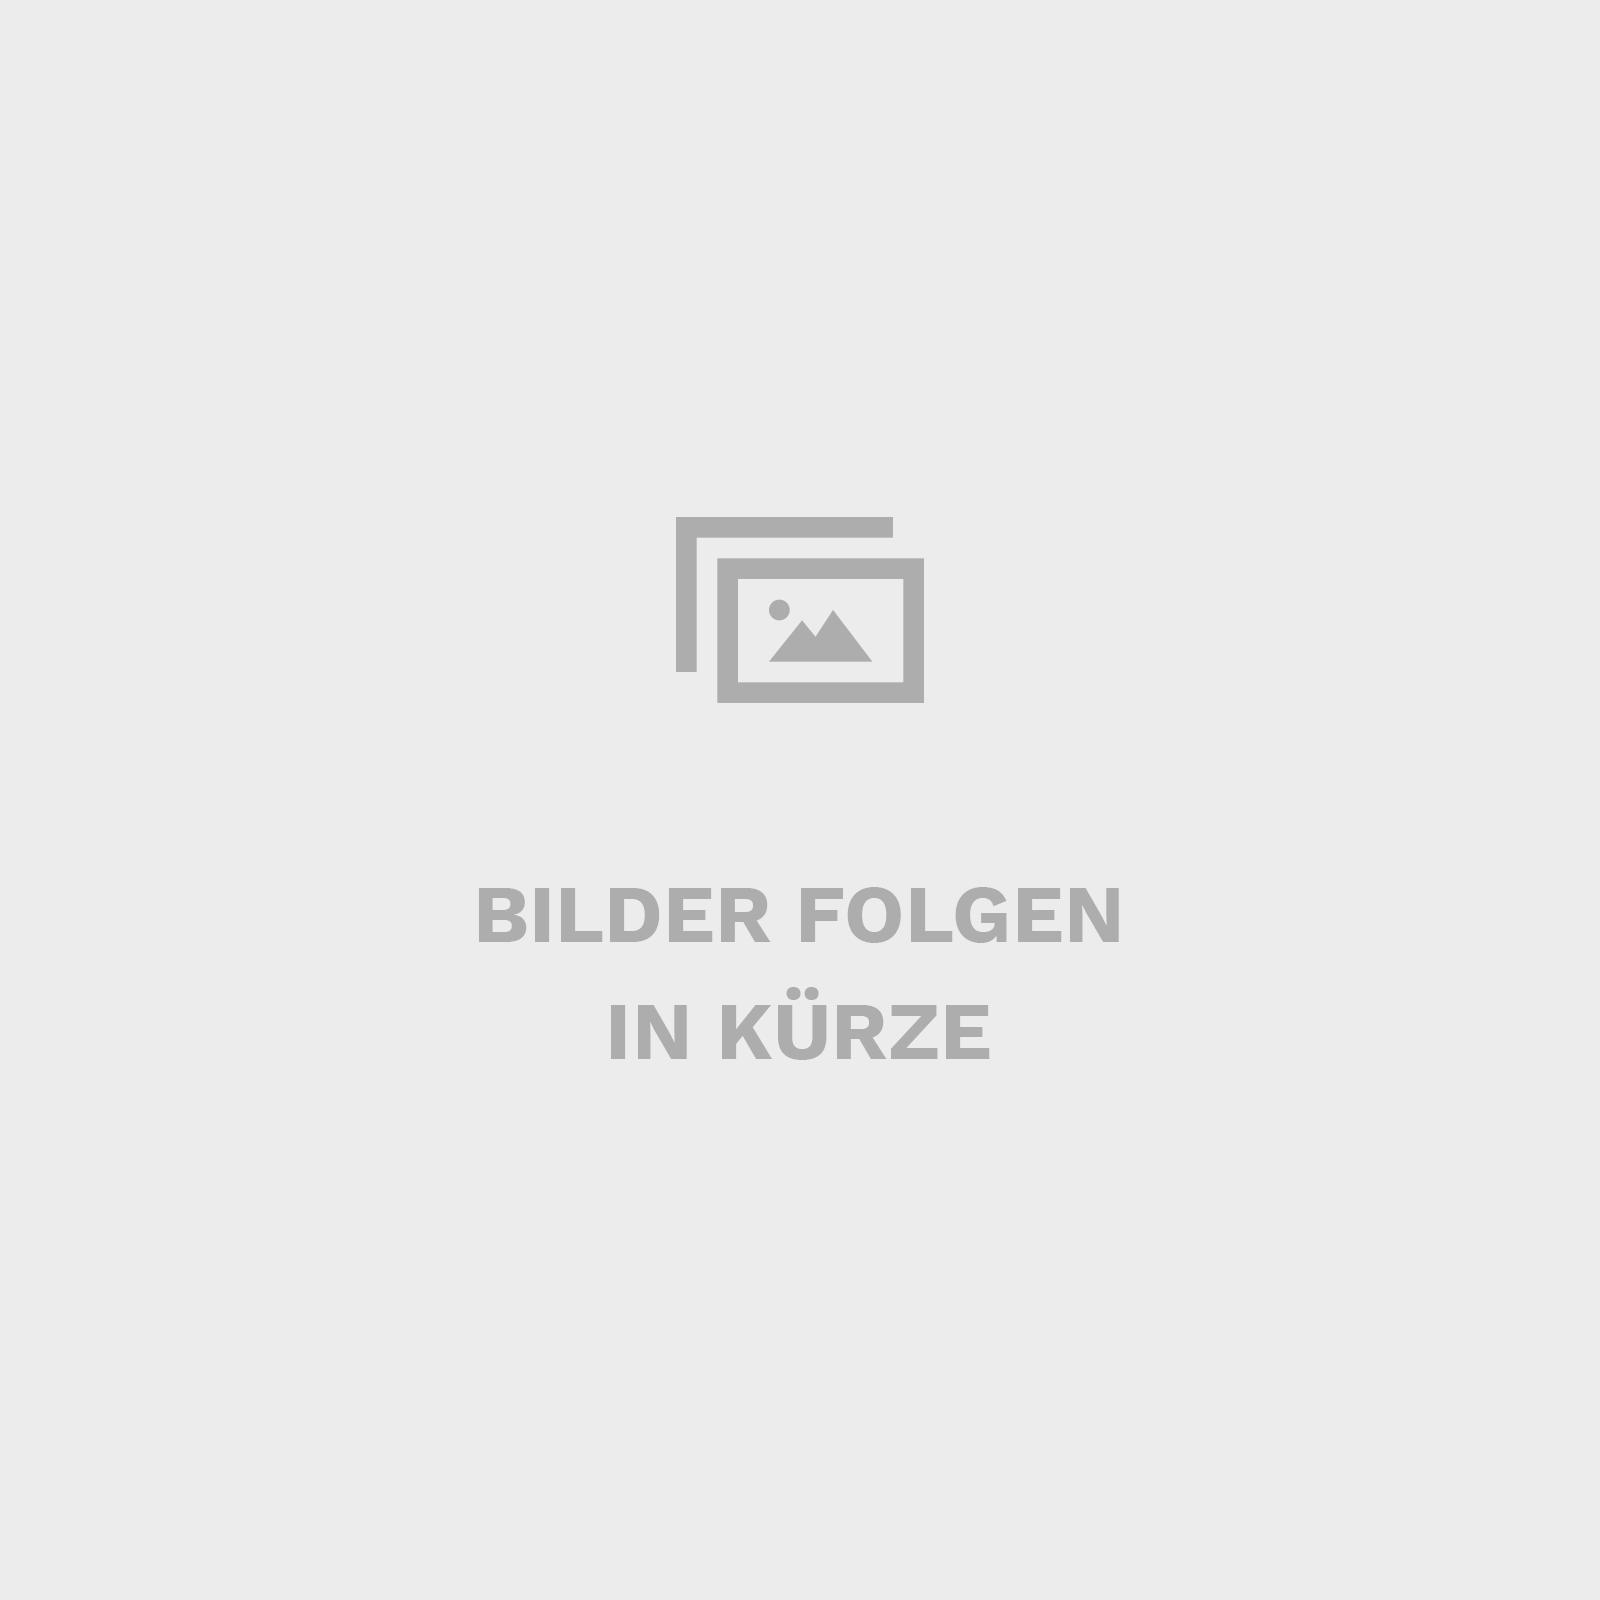 Kvadrat Rugs - Duotone - Farbe 0692 - Detailansicht